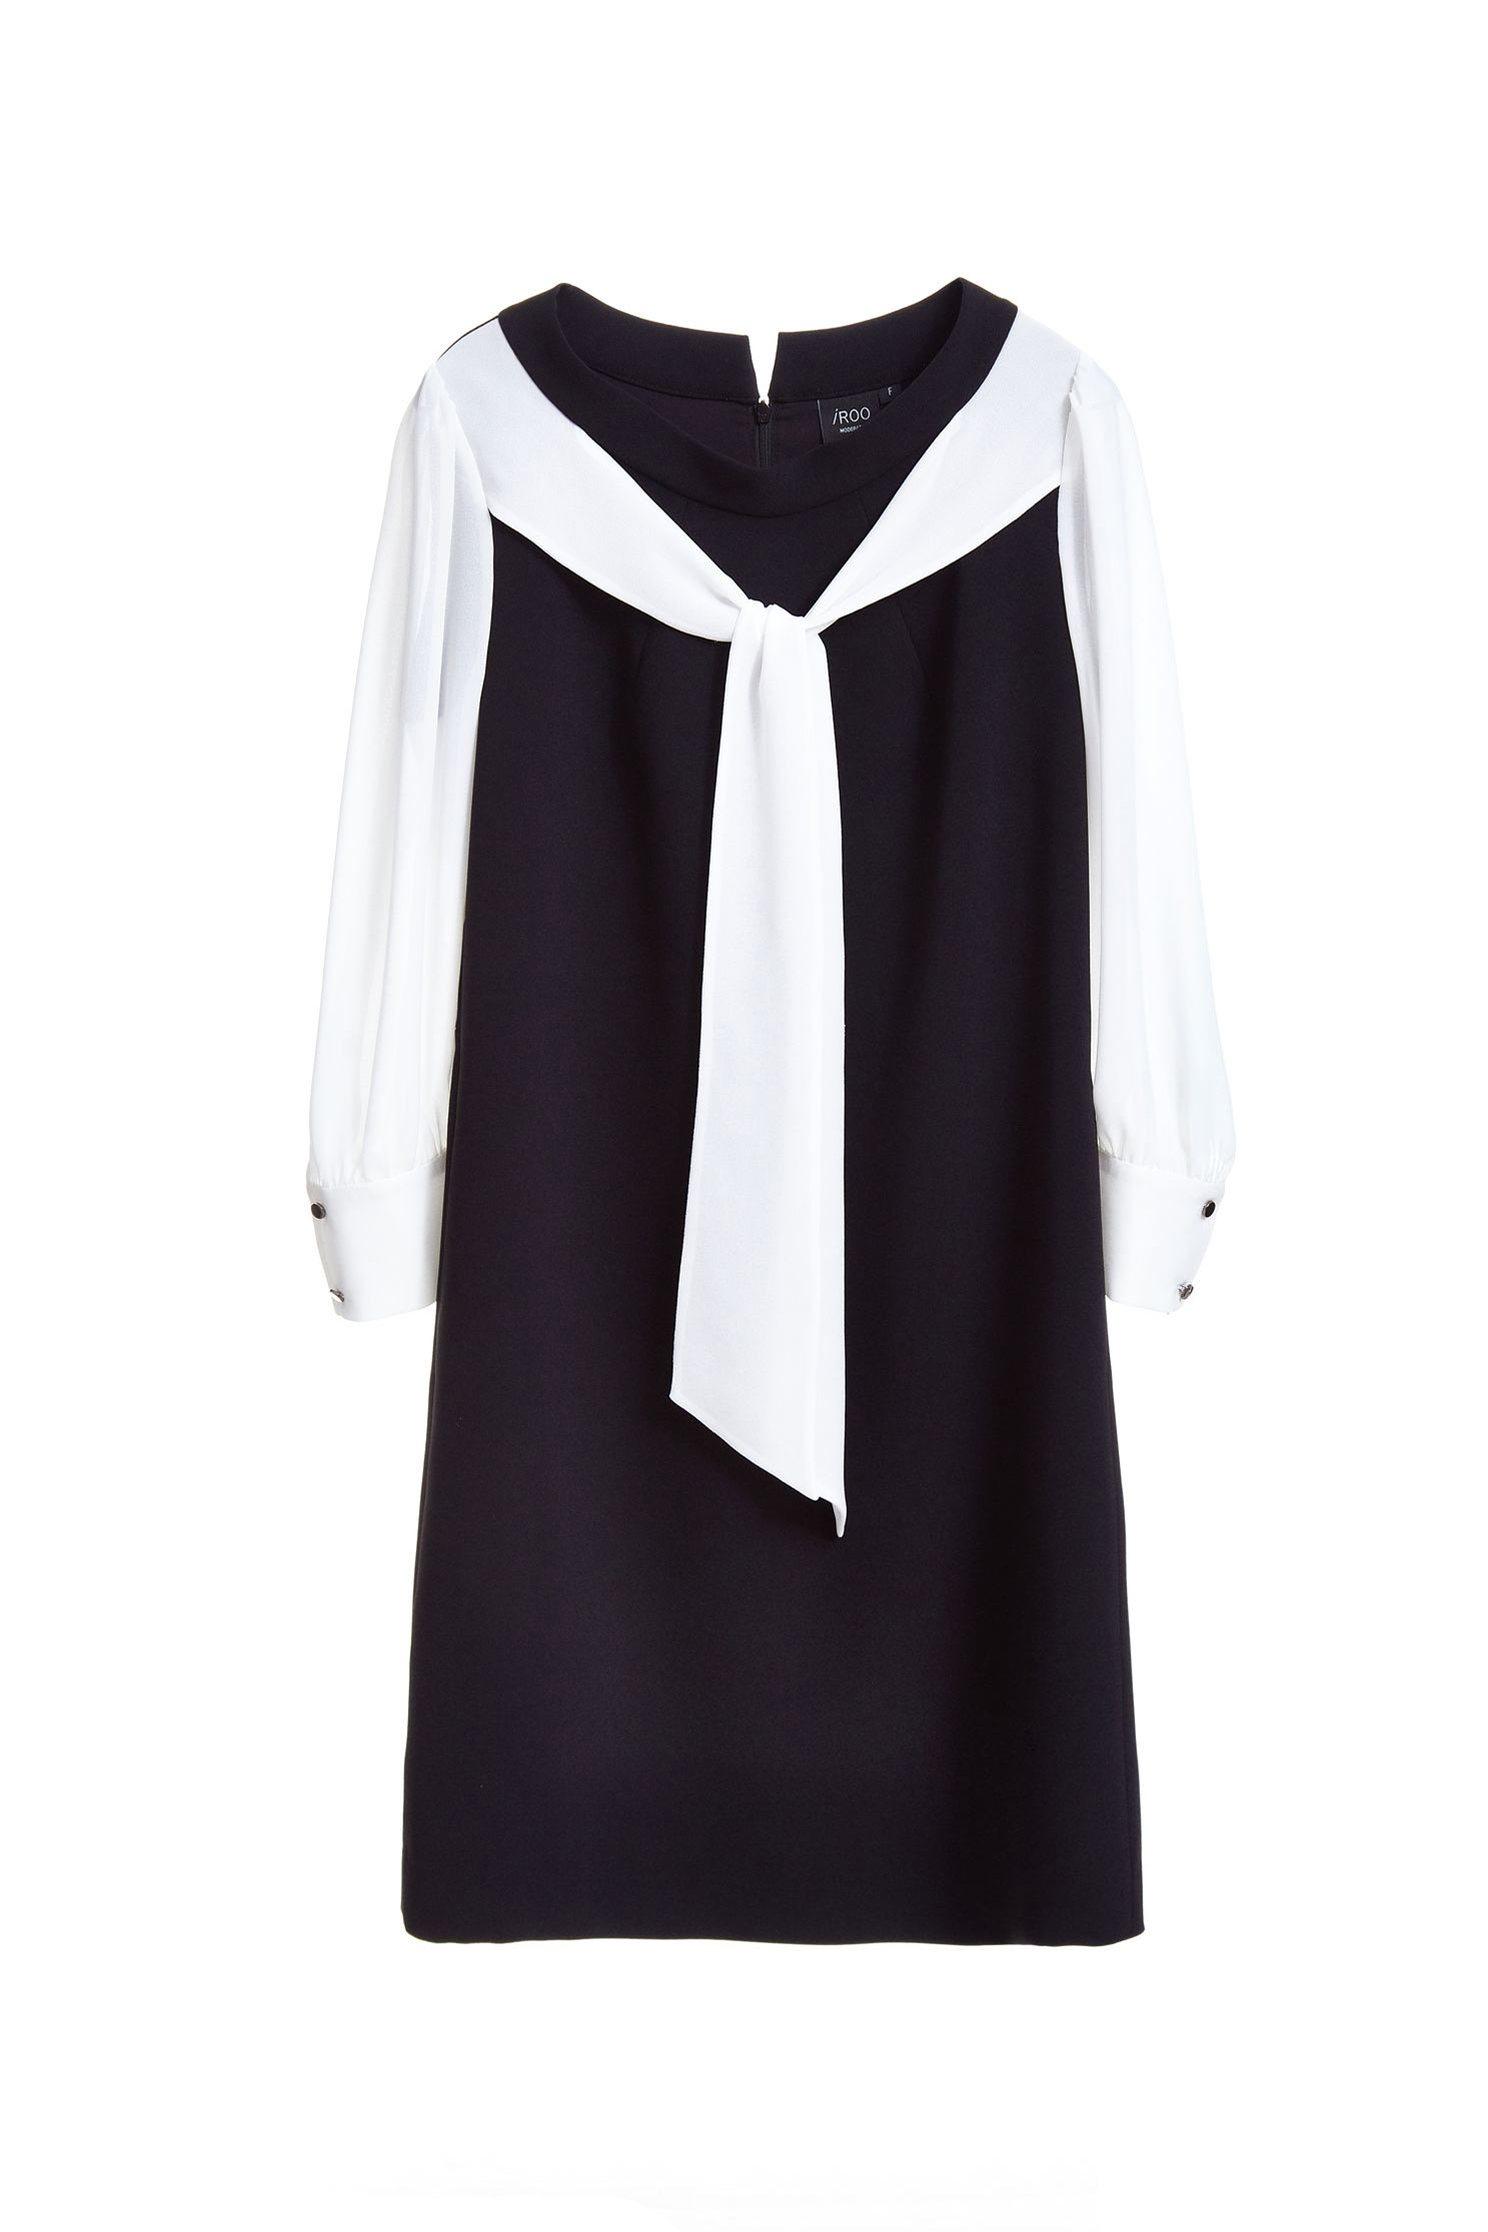 Layerd-look fashion sleeveless dress